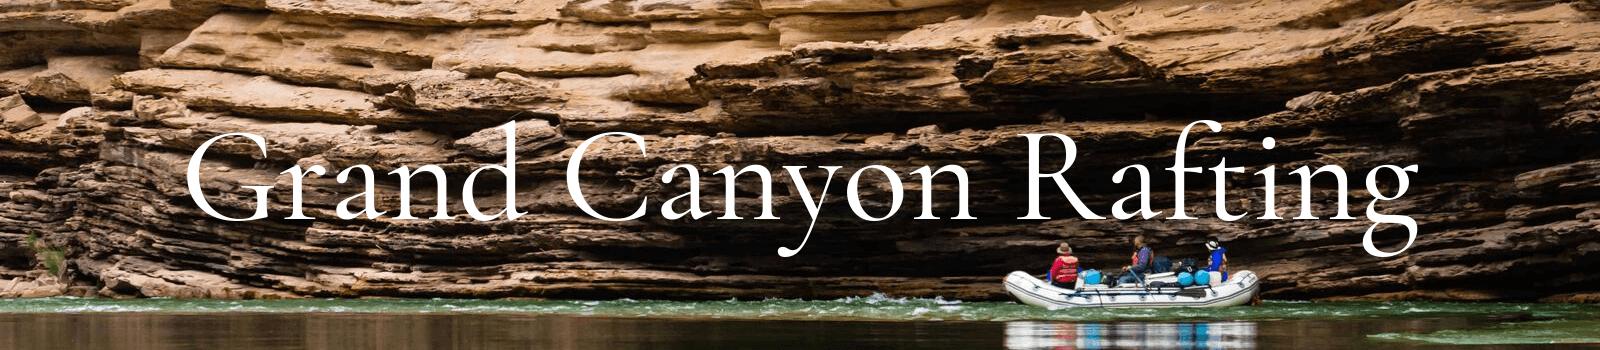 Grand Canyon Rafting Bannre